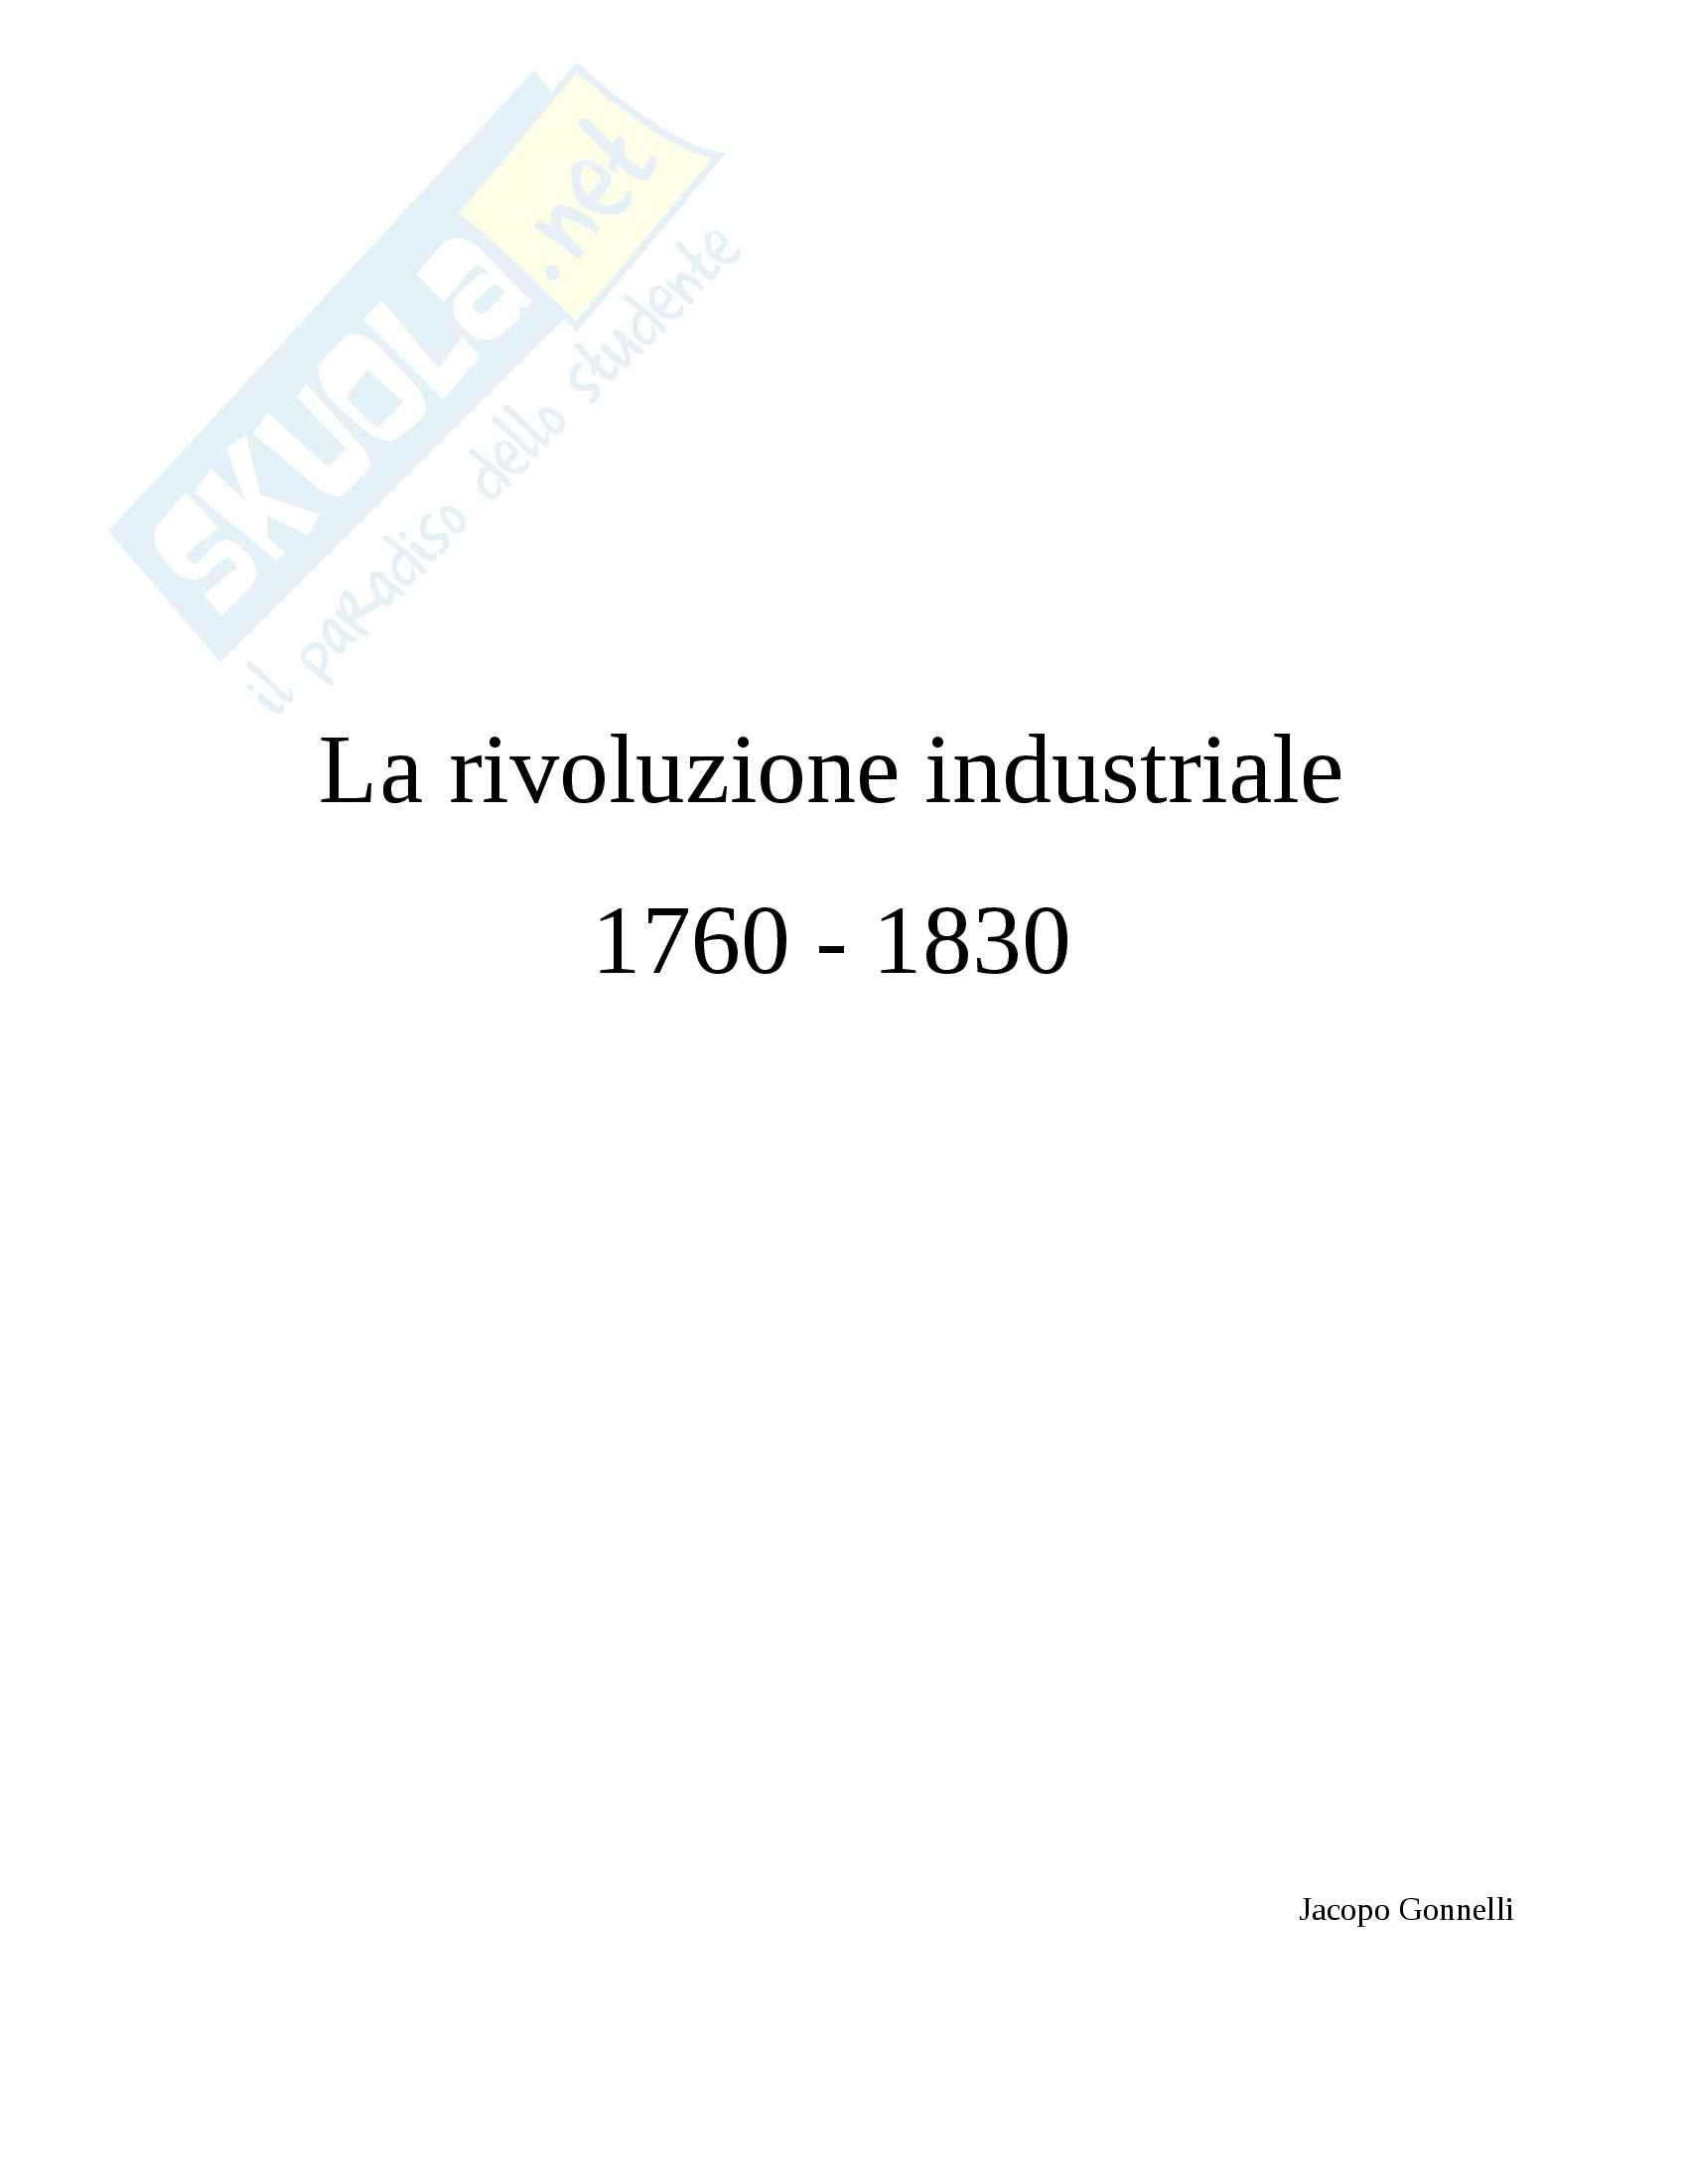 Rivoluzione Industriale 1760-1830, Storia moderna